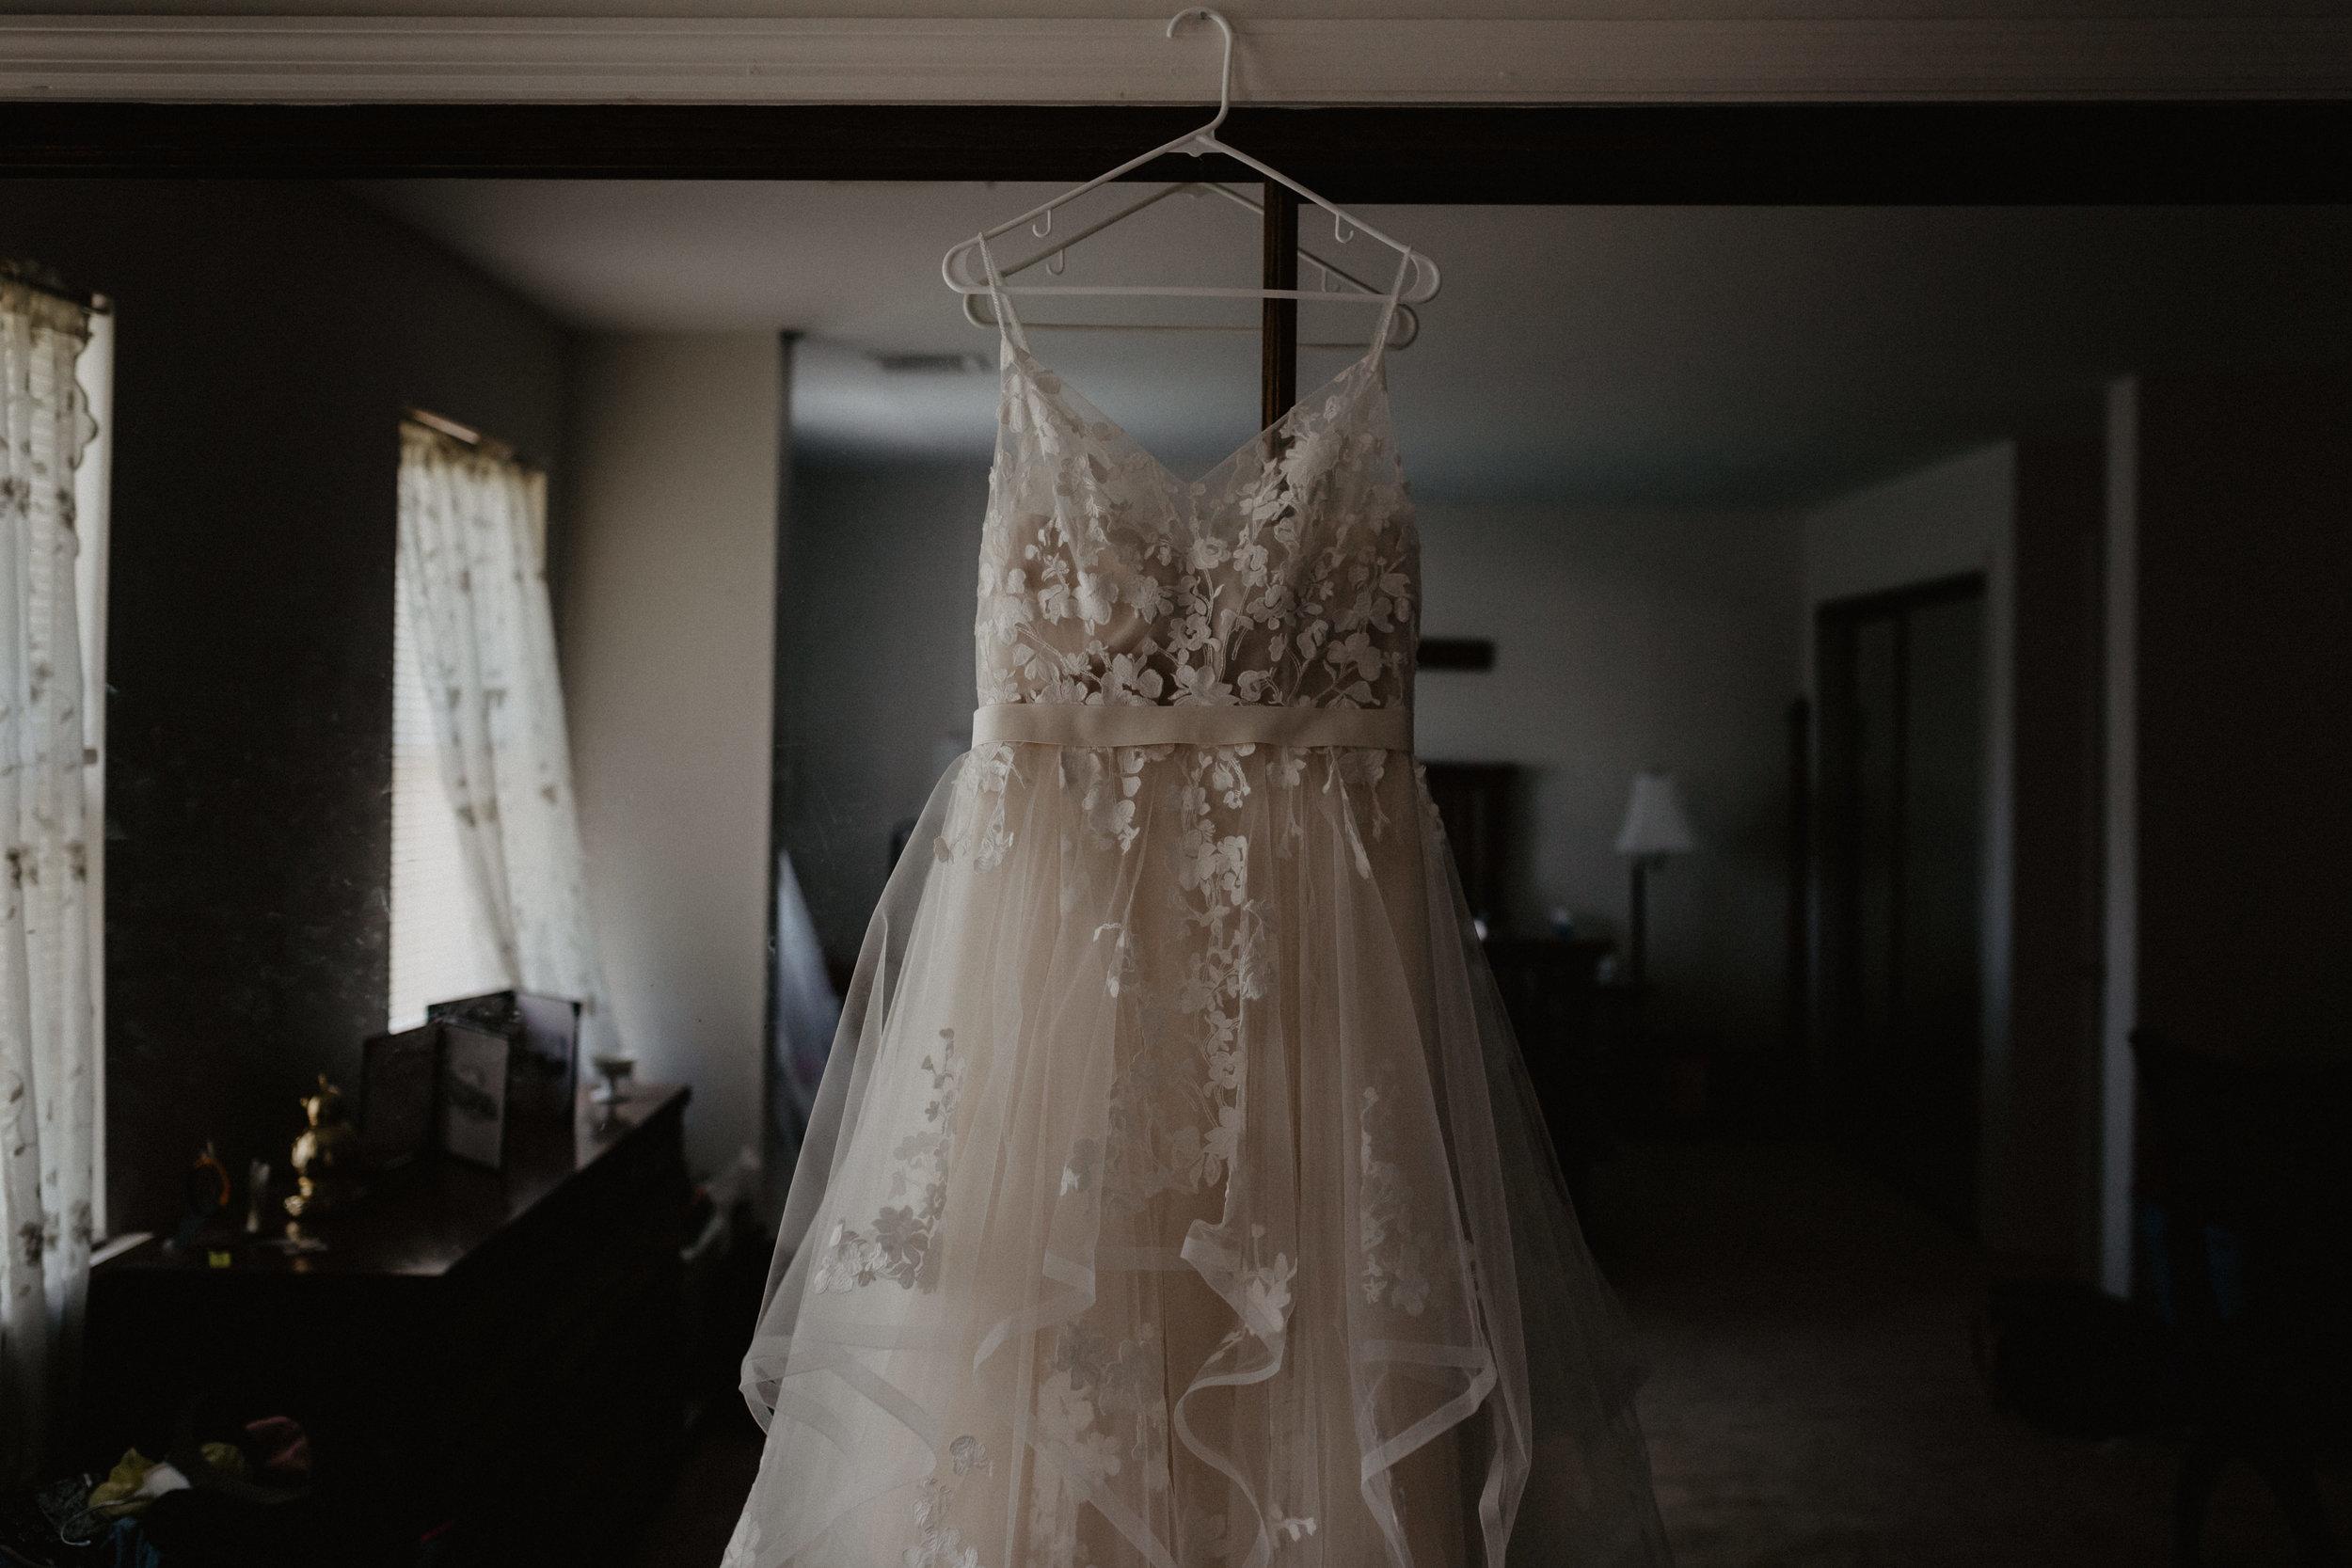 upstate_ny_wedding-12.jpg